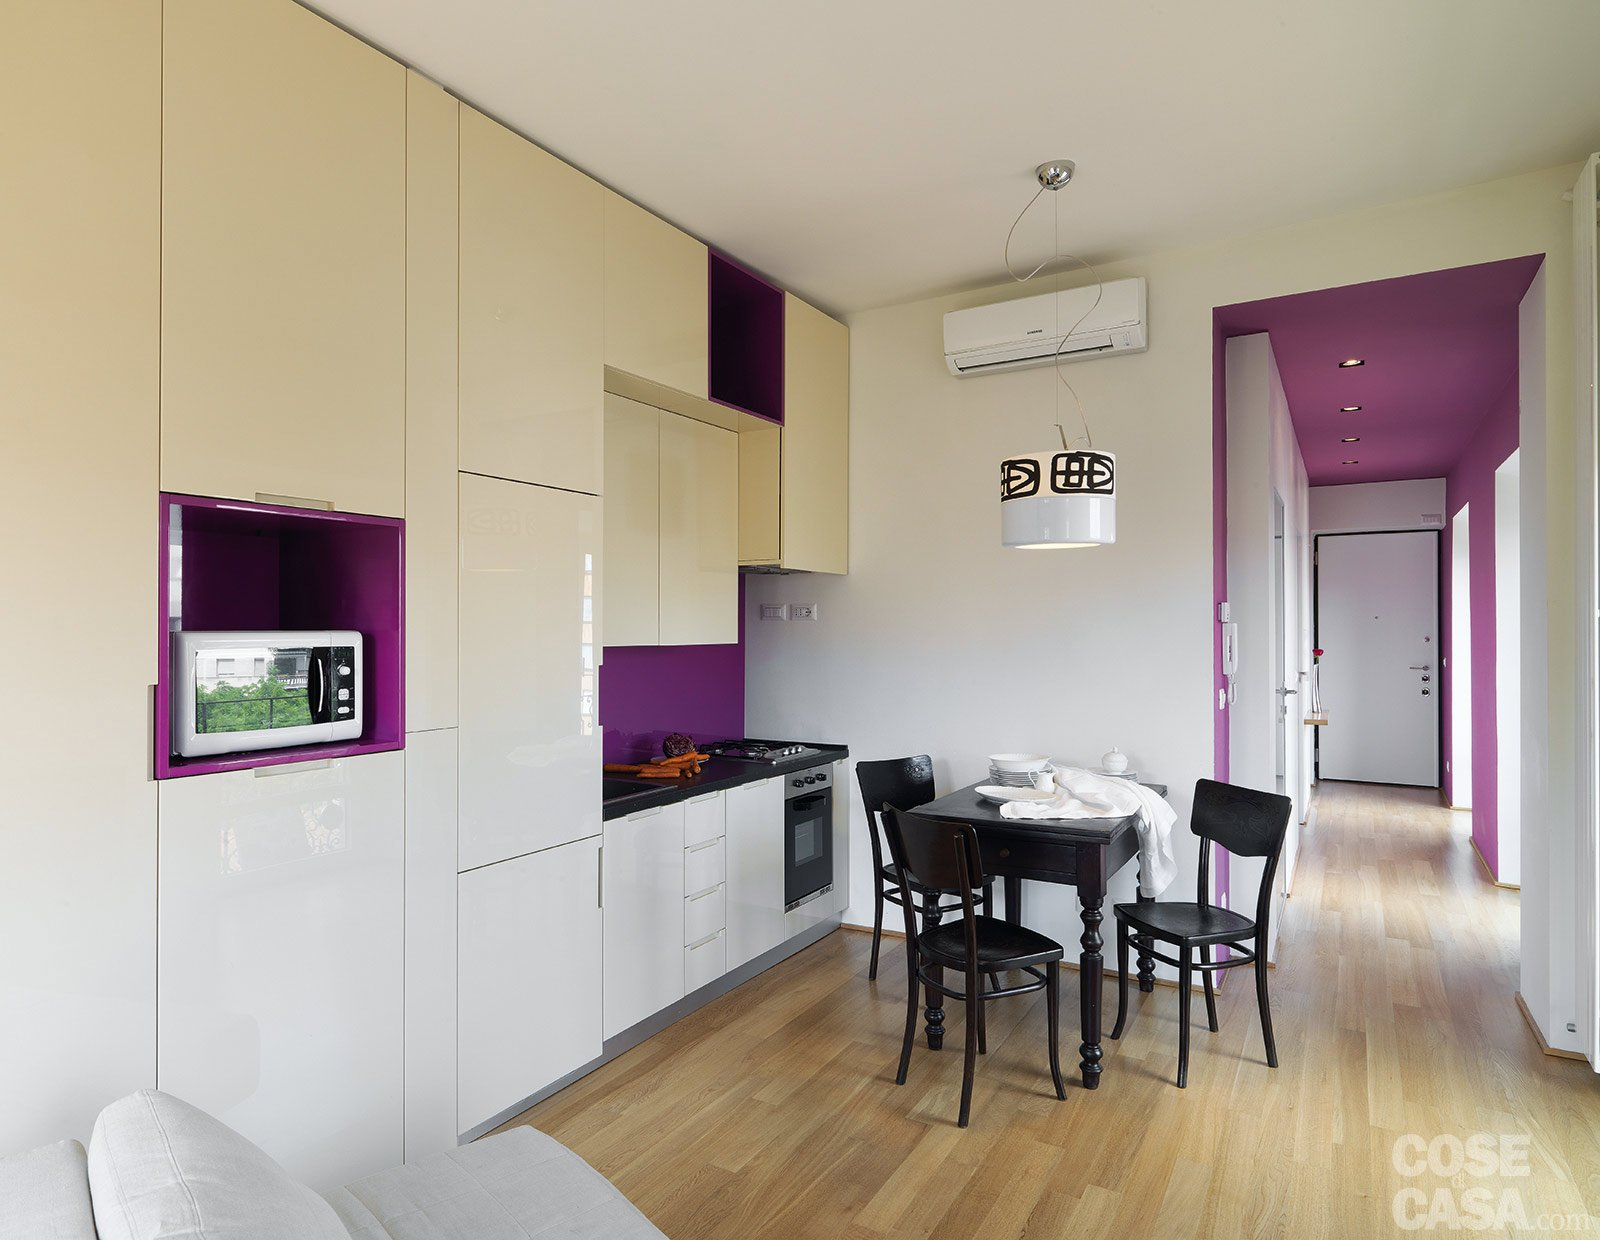 Immagini Di Cucina E Sala Insieme | madgeweb.com idee di interior ...